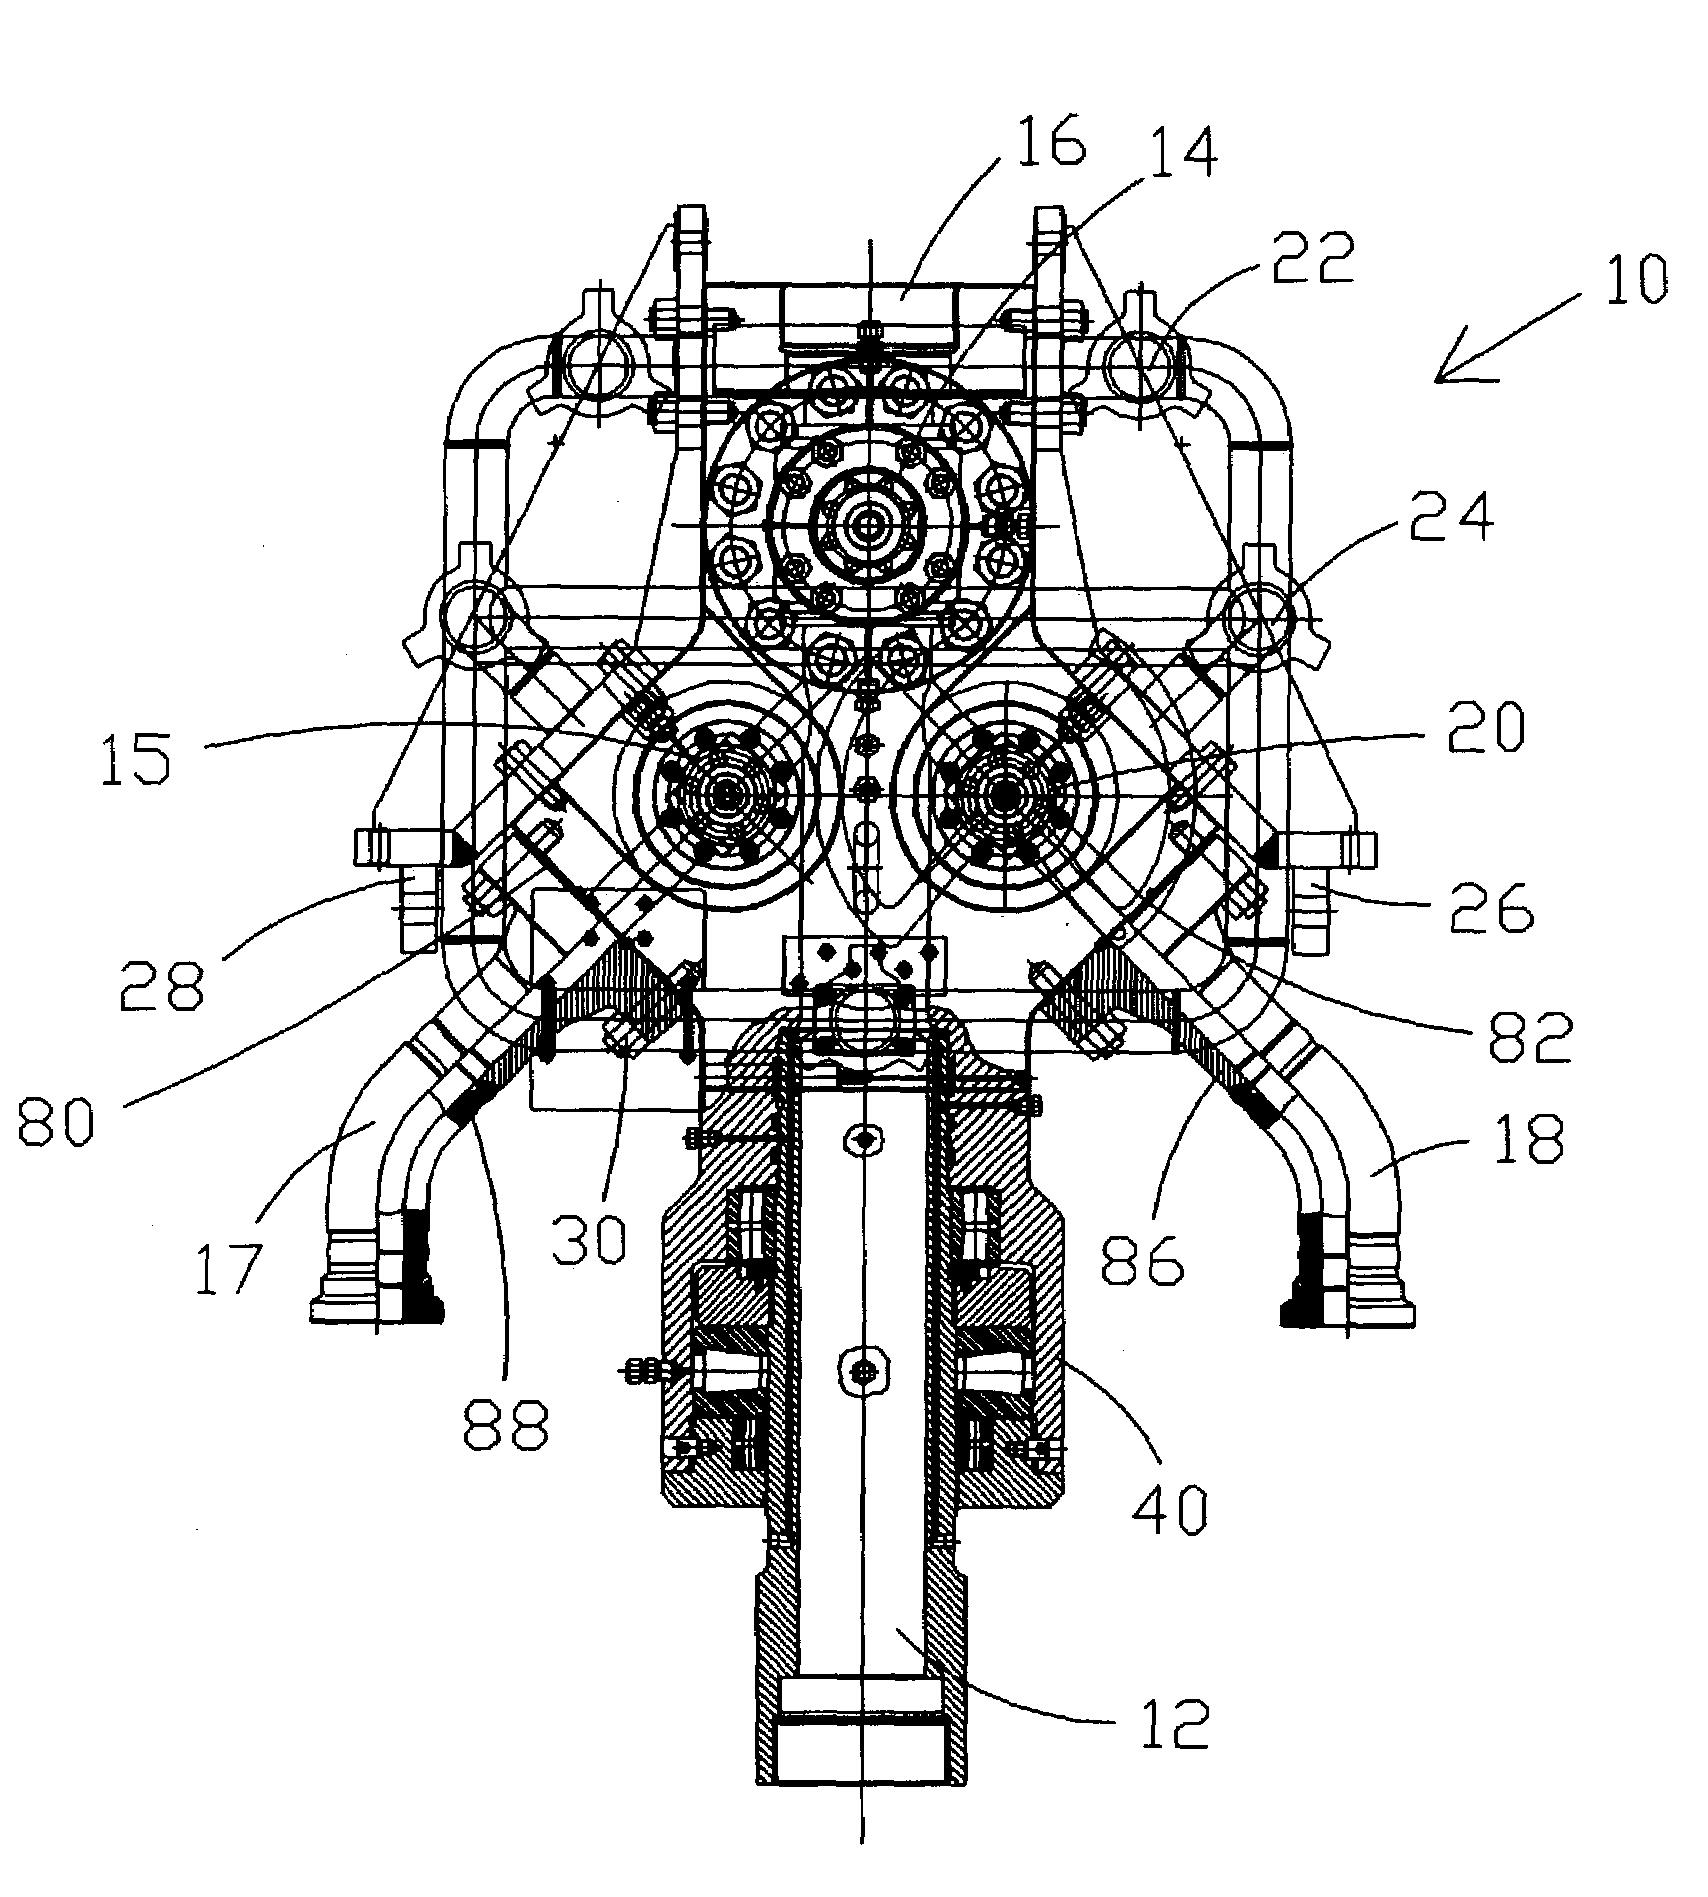 patent us7040408 - flowhead and method